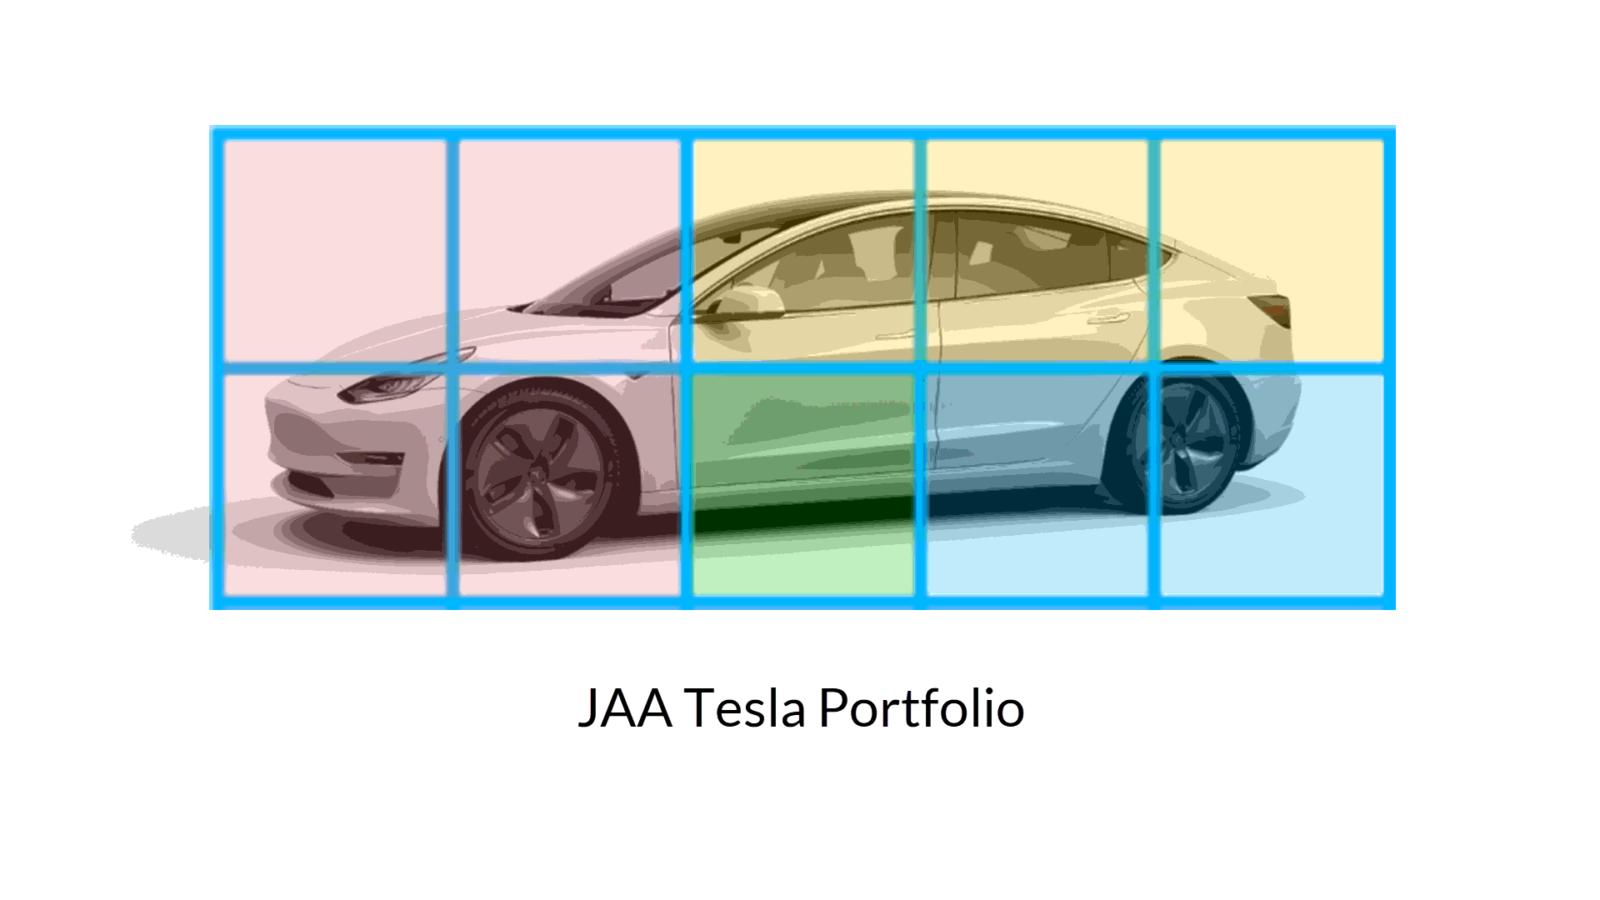 JAA Tesla shared-ownership vehicles